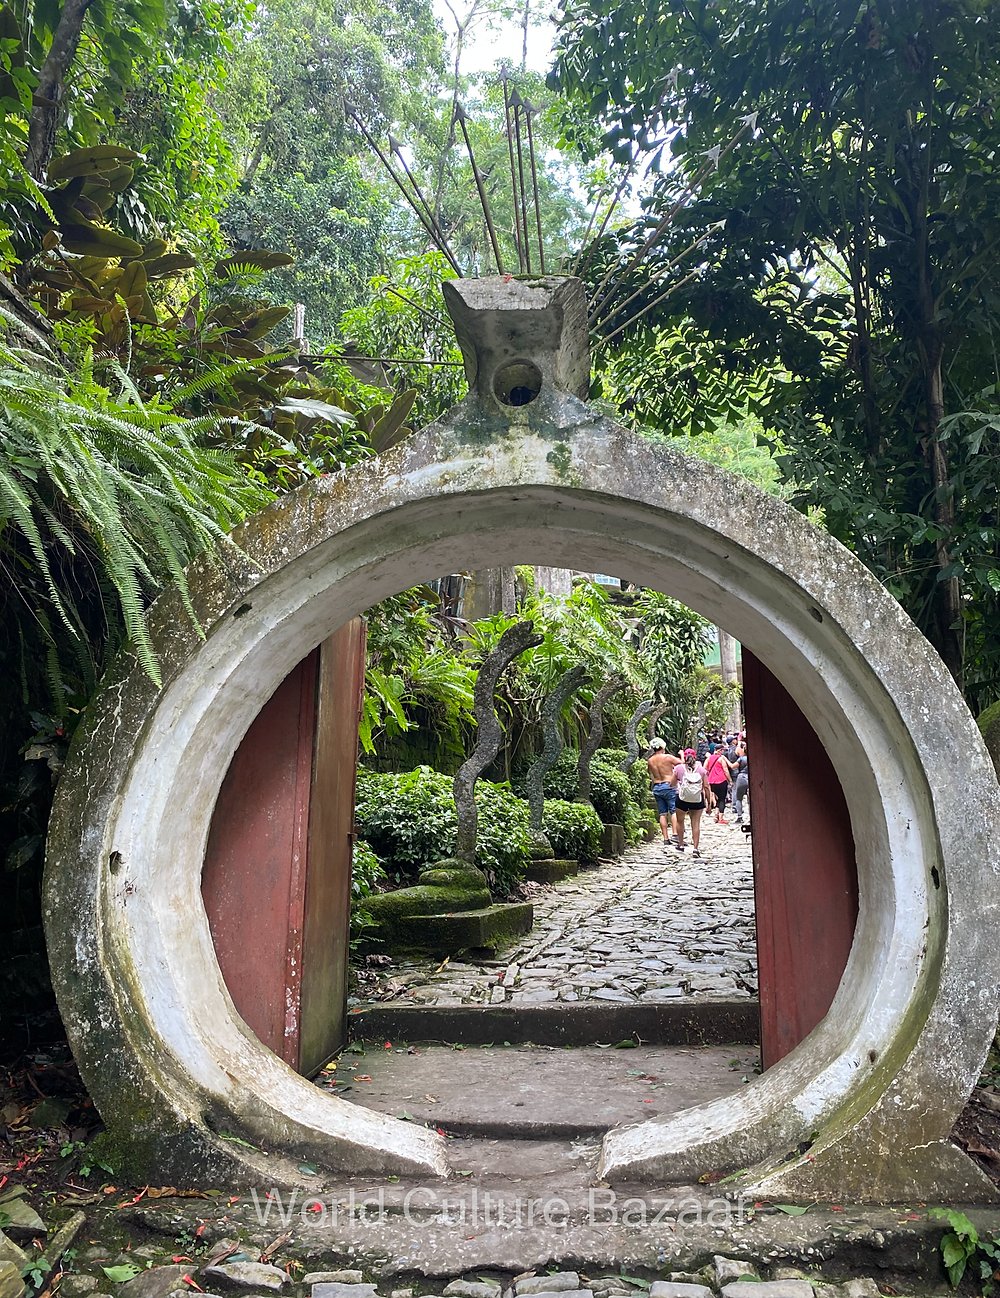 Xilitla. las Pozas. Edward James. Surrealistic garden. The ring